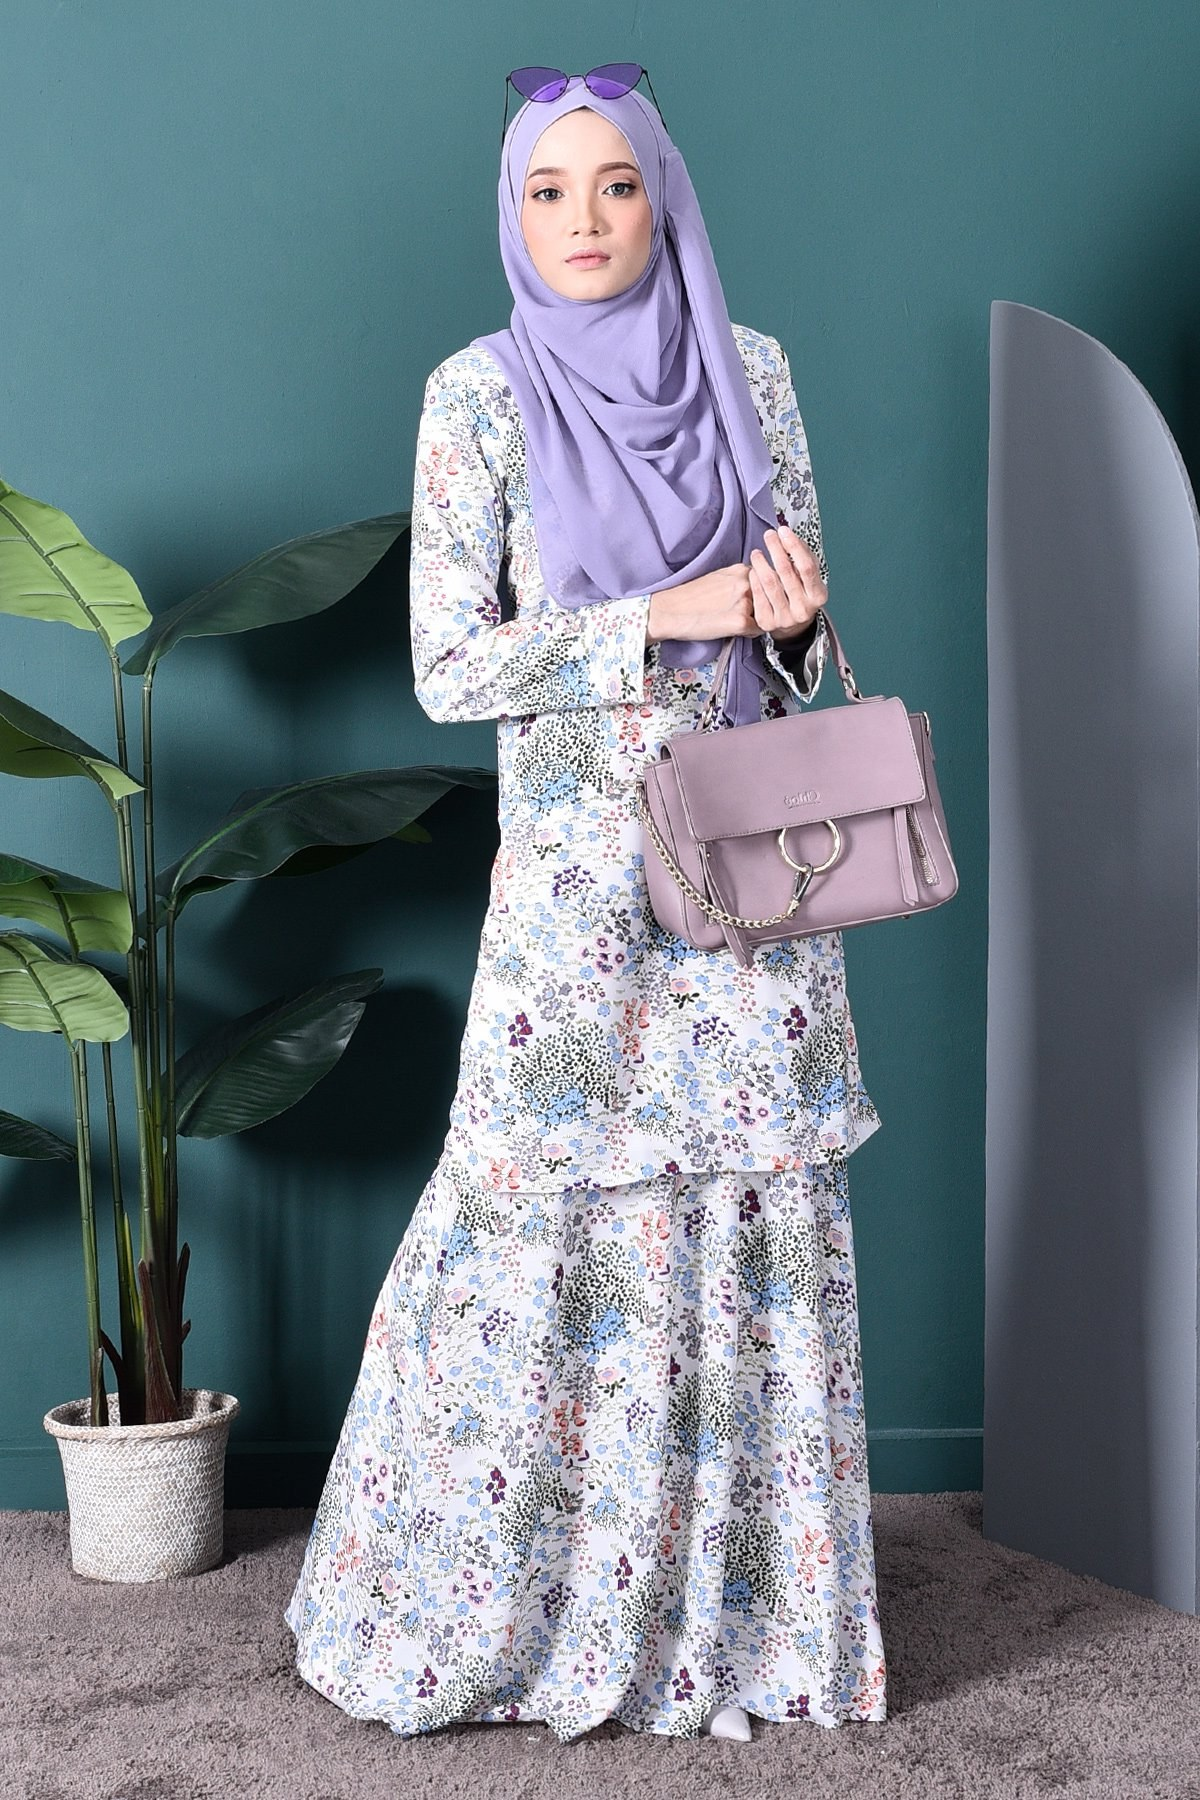 Ide Gaun Bridesmaid Hijab 0gdr Baju Kurung Agnes – Cotton White – Muslimahclothing